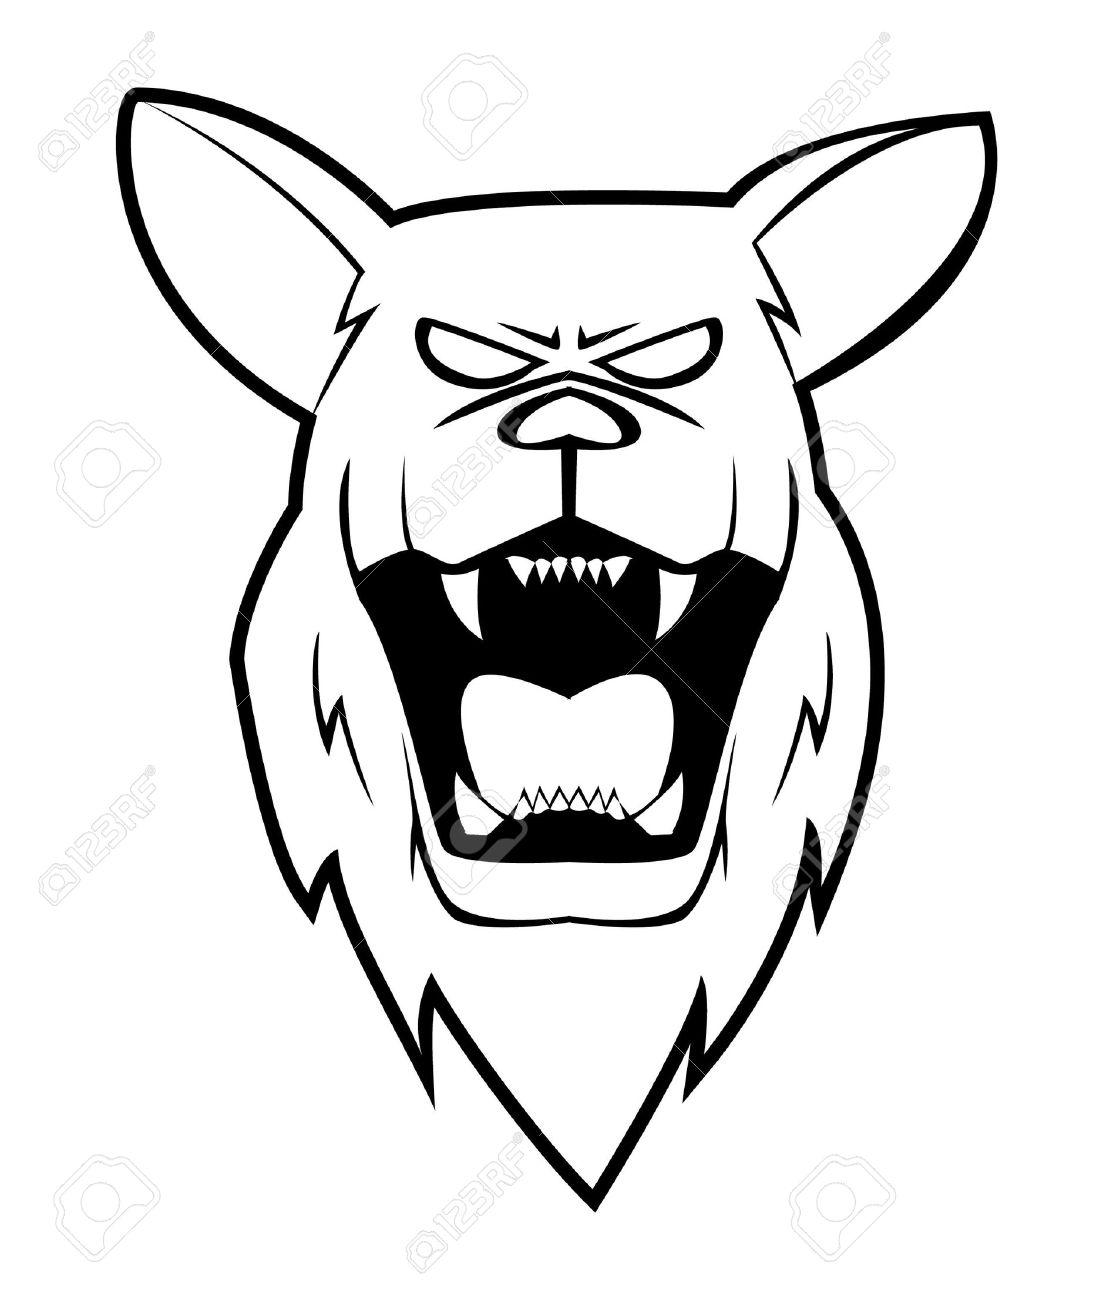 Photo Angry Shepherd Dog Face Jpg 1113x1300 Angry Dog Head Drawings